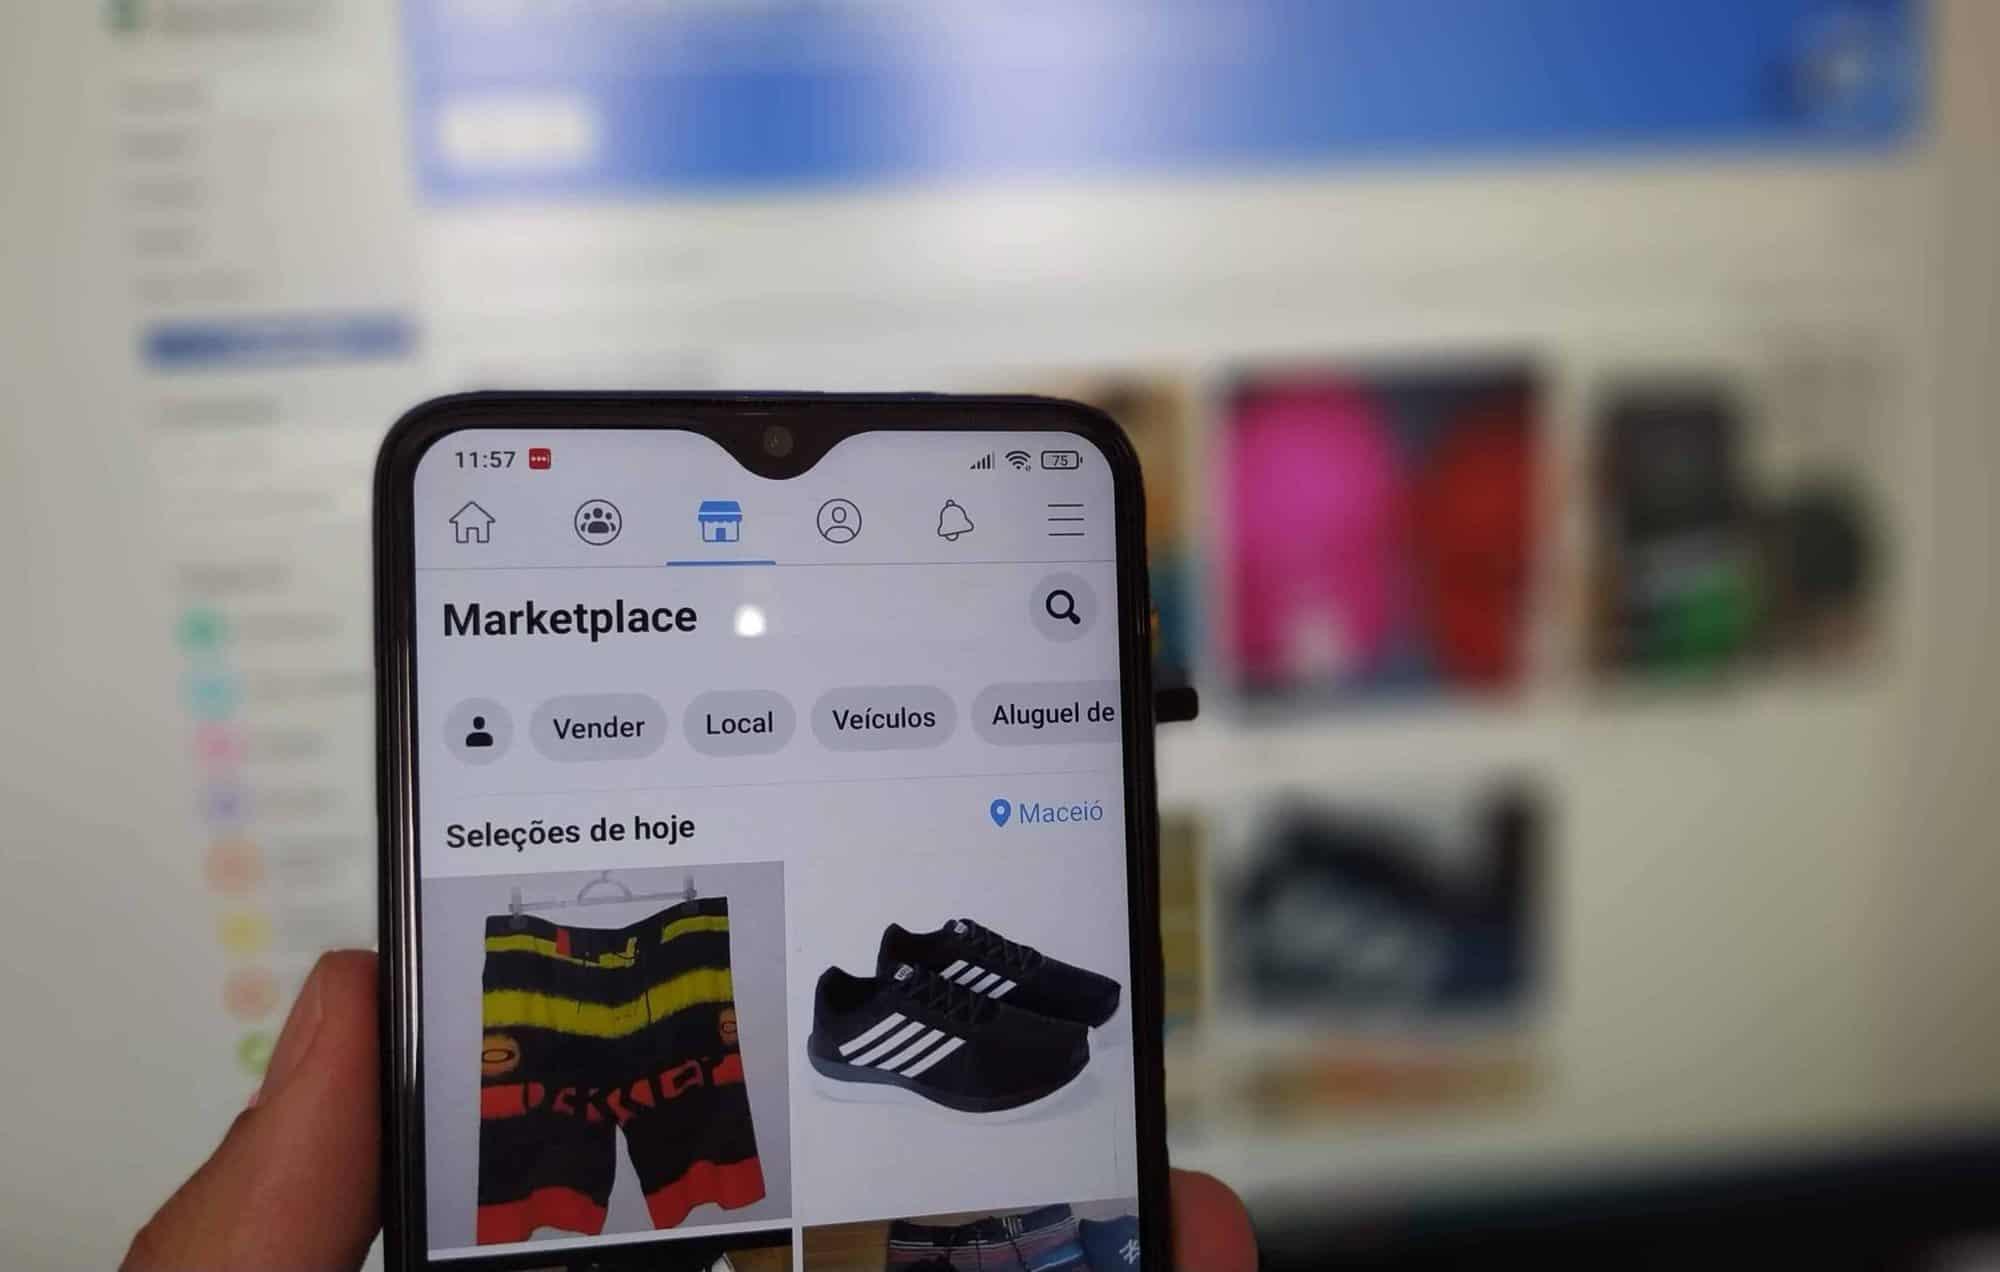 Marketplace: como usar a ferramenta de compra e venda do Facebook - Olhar Digital